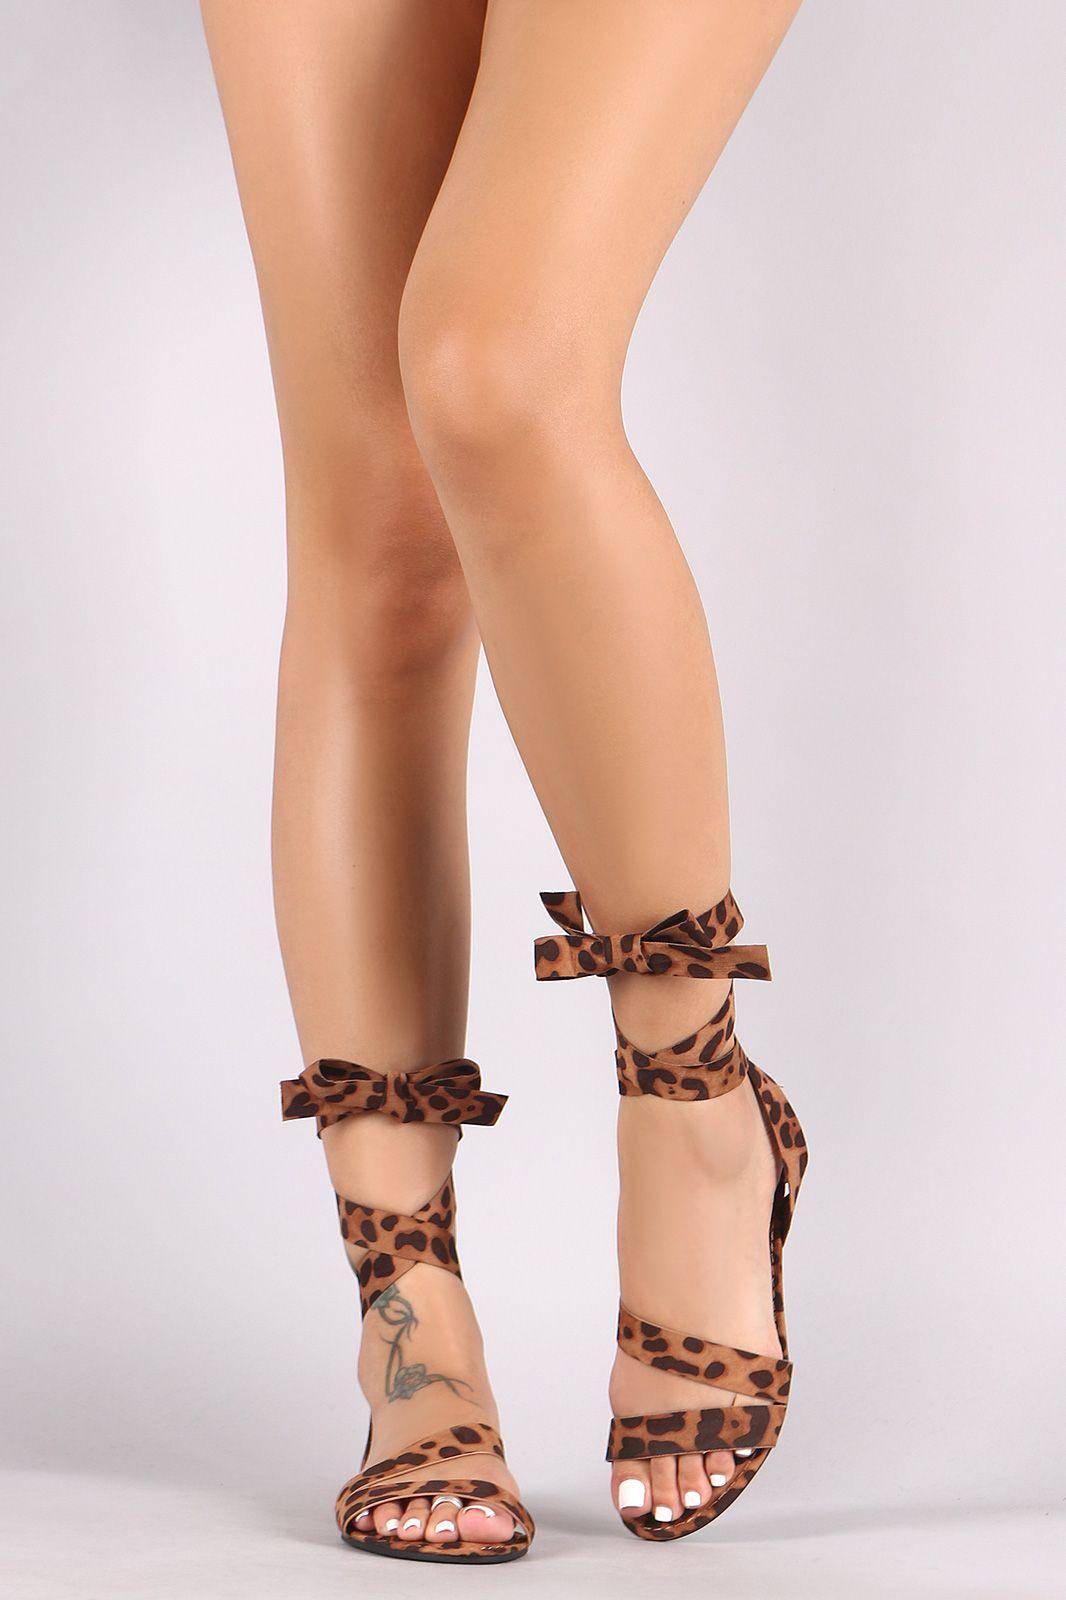 ad04120fb08999 Bamboo Leopard Open Toe Strappy Leg Wrap Flat Sandal